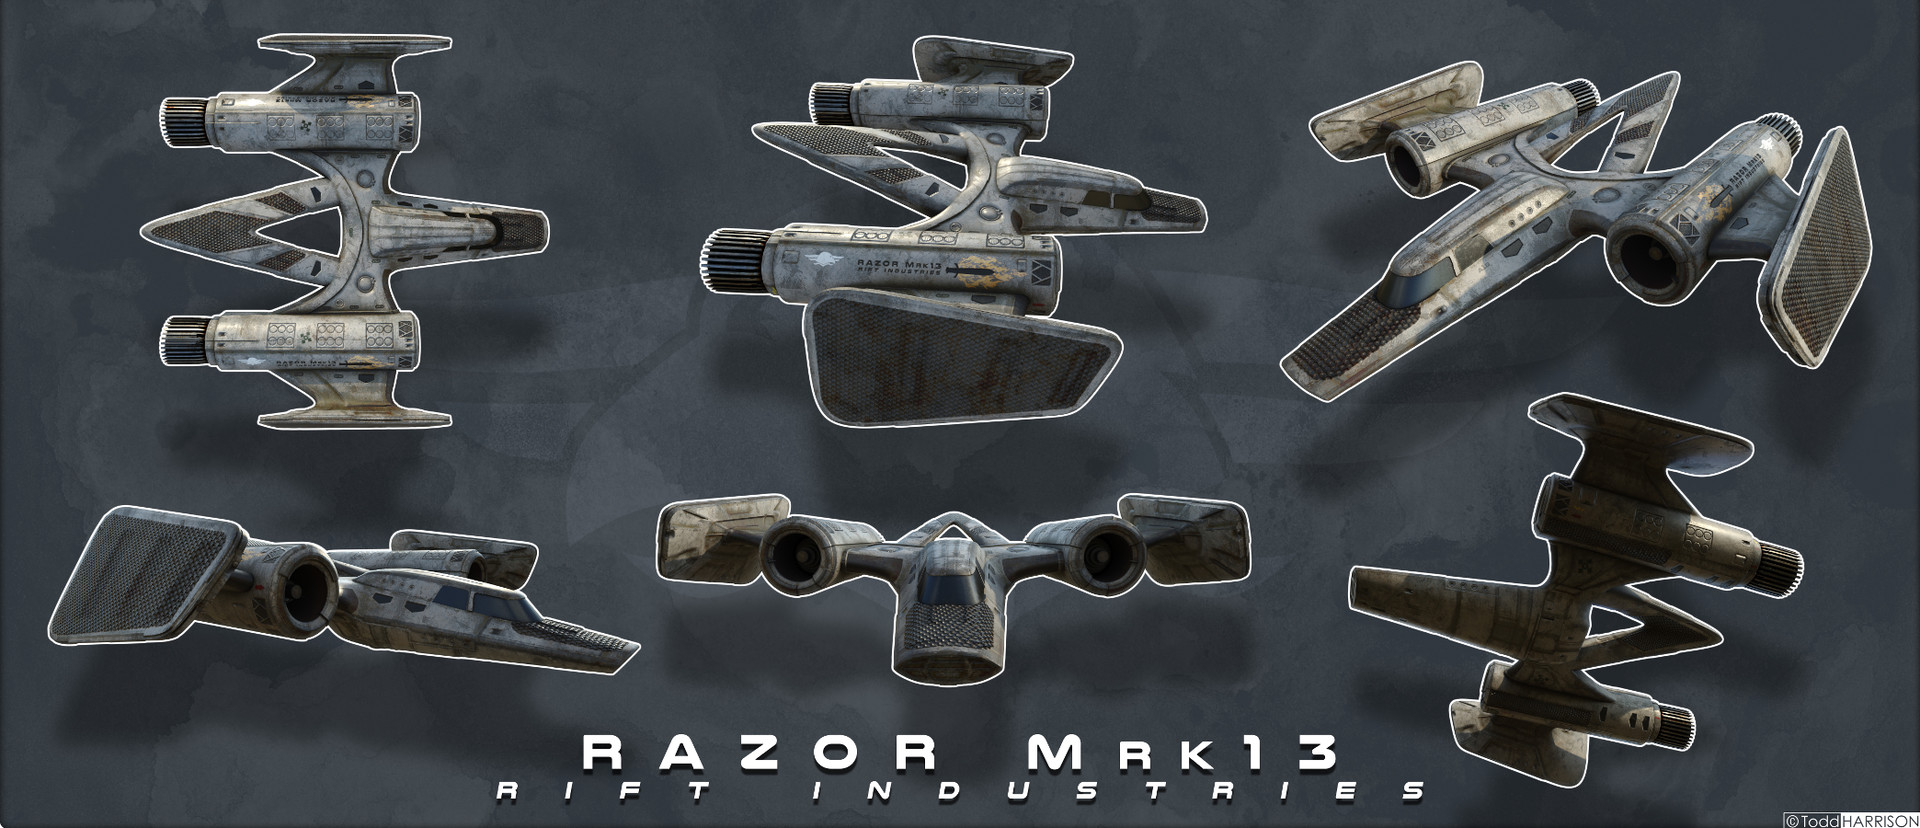 Todd harrison ri razor mrk13 6v low